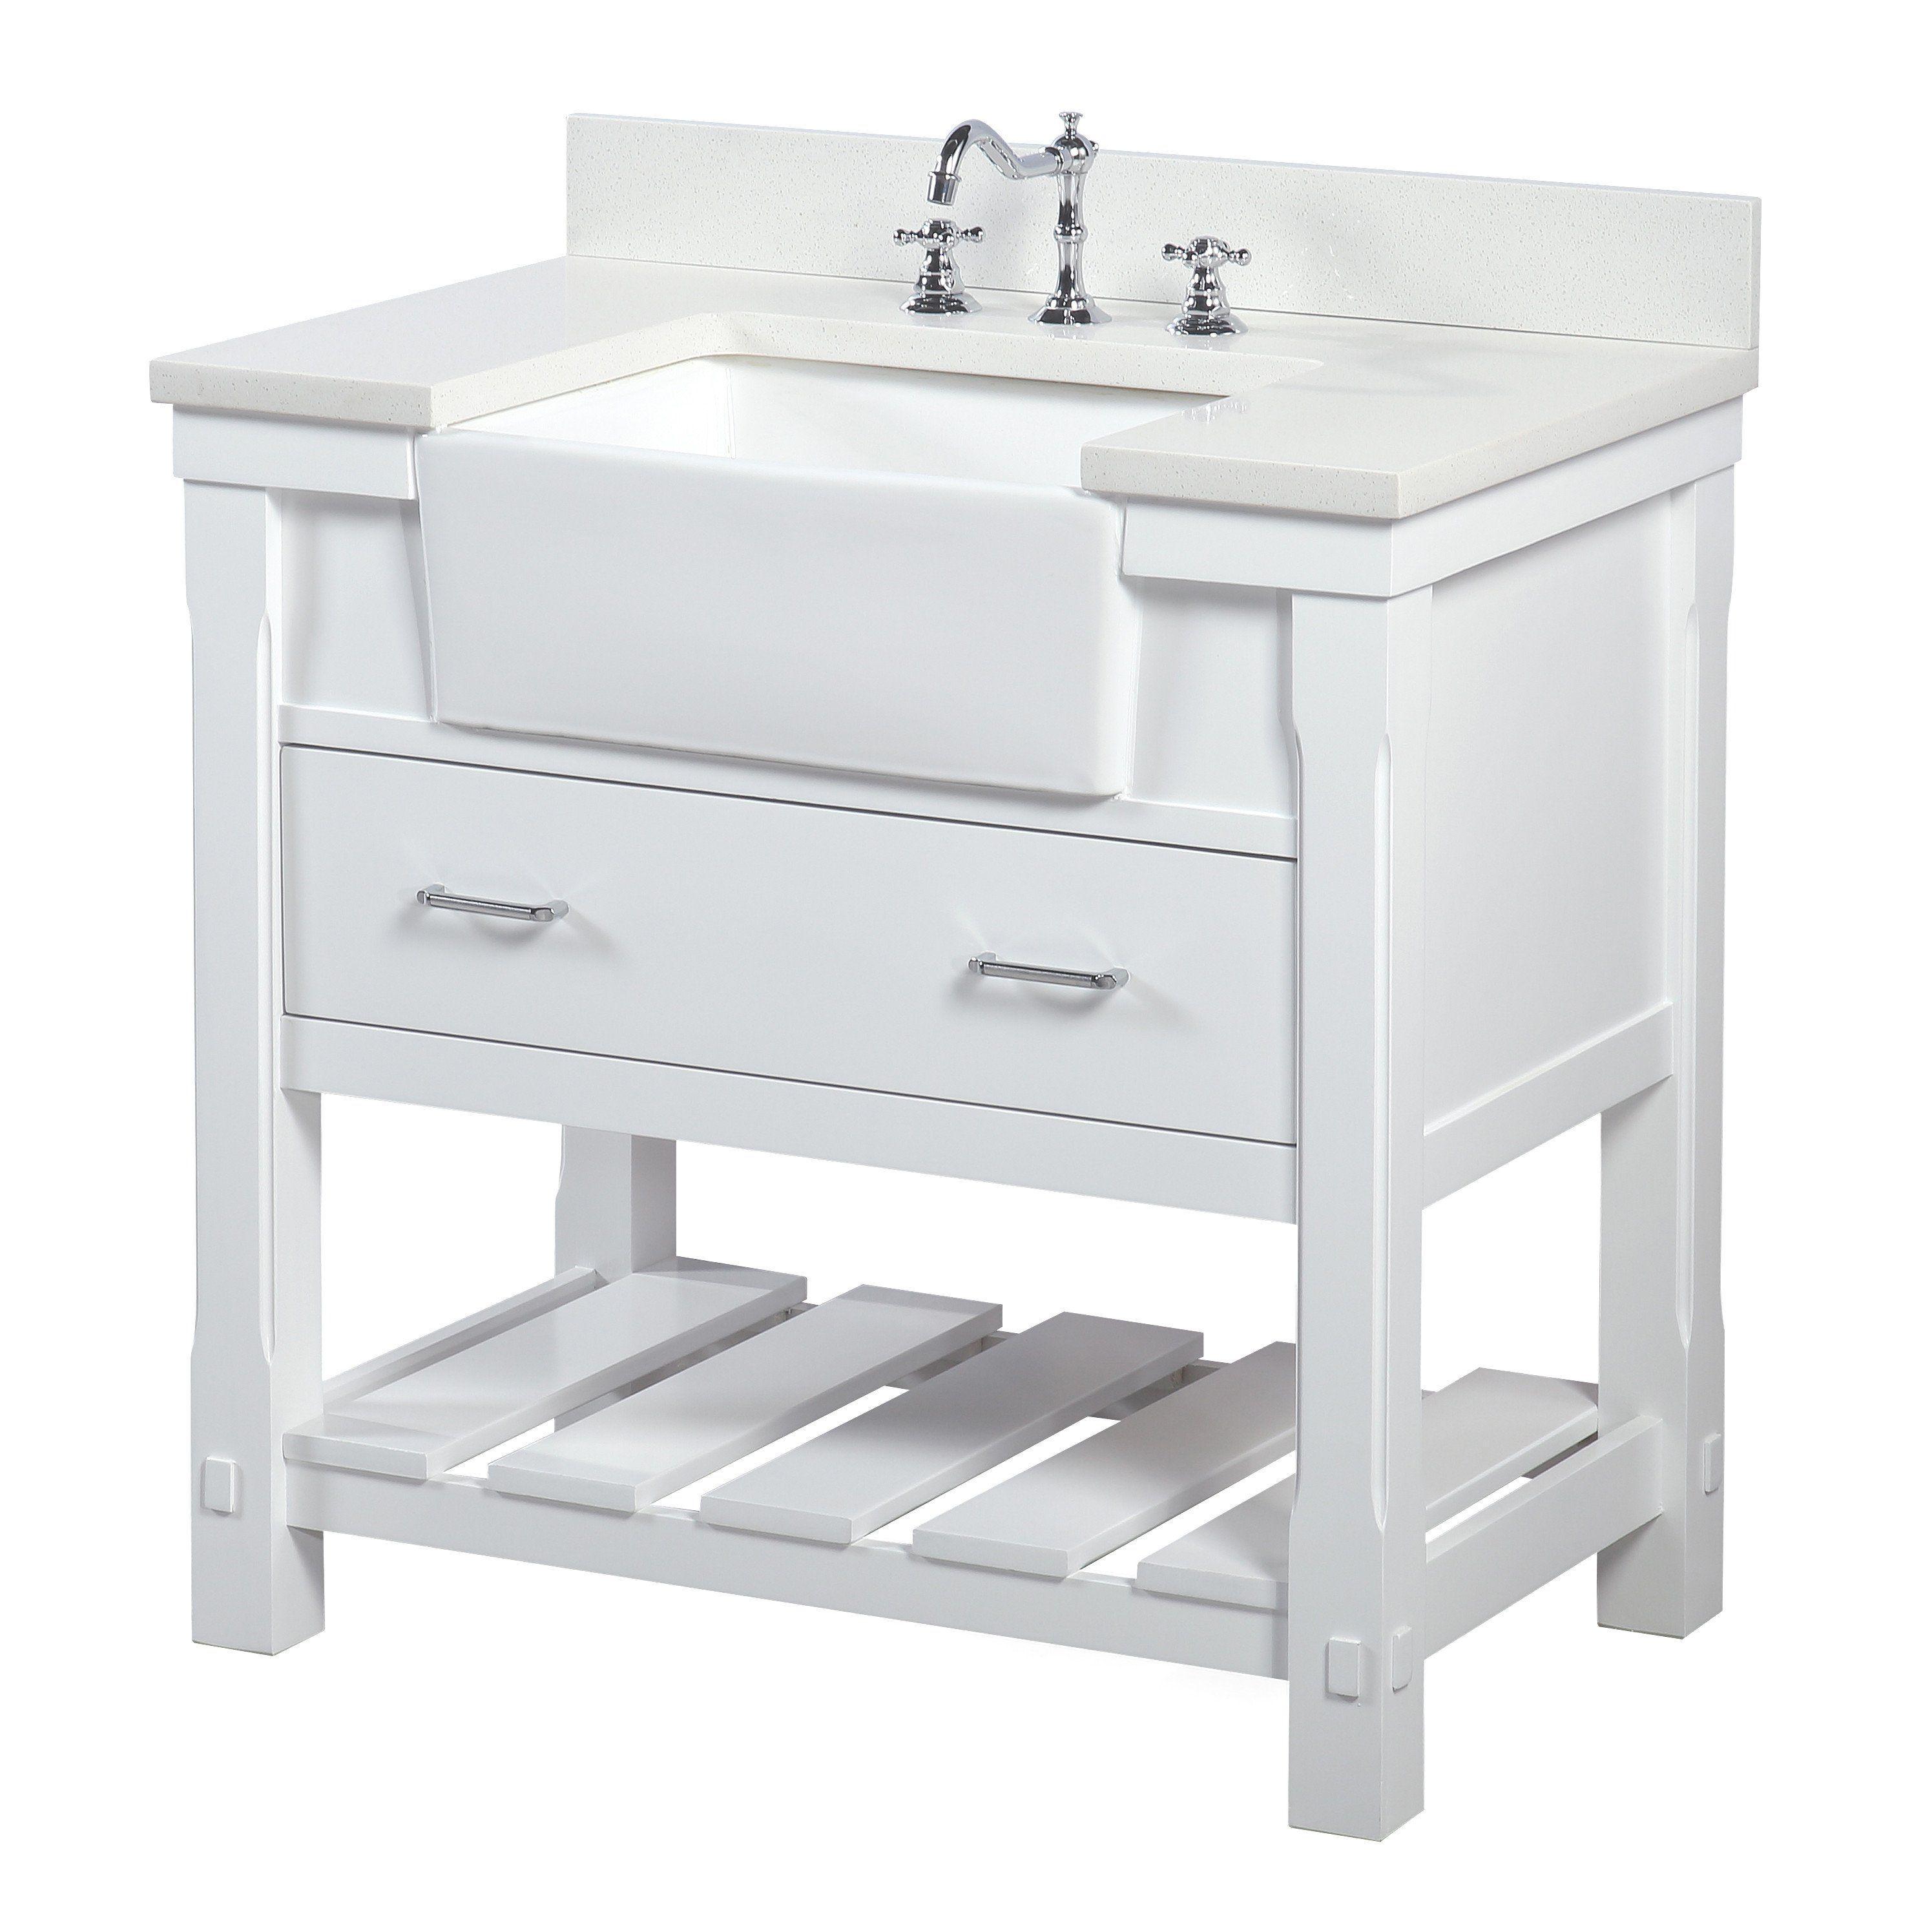 Charlotte 36 Inch Farmhouse Vanity With Quartz Top Single Bathroom Vanity Bathroom Vanity Farmhouse Vanity [ 2991 x 2991 Pixel ]